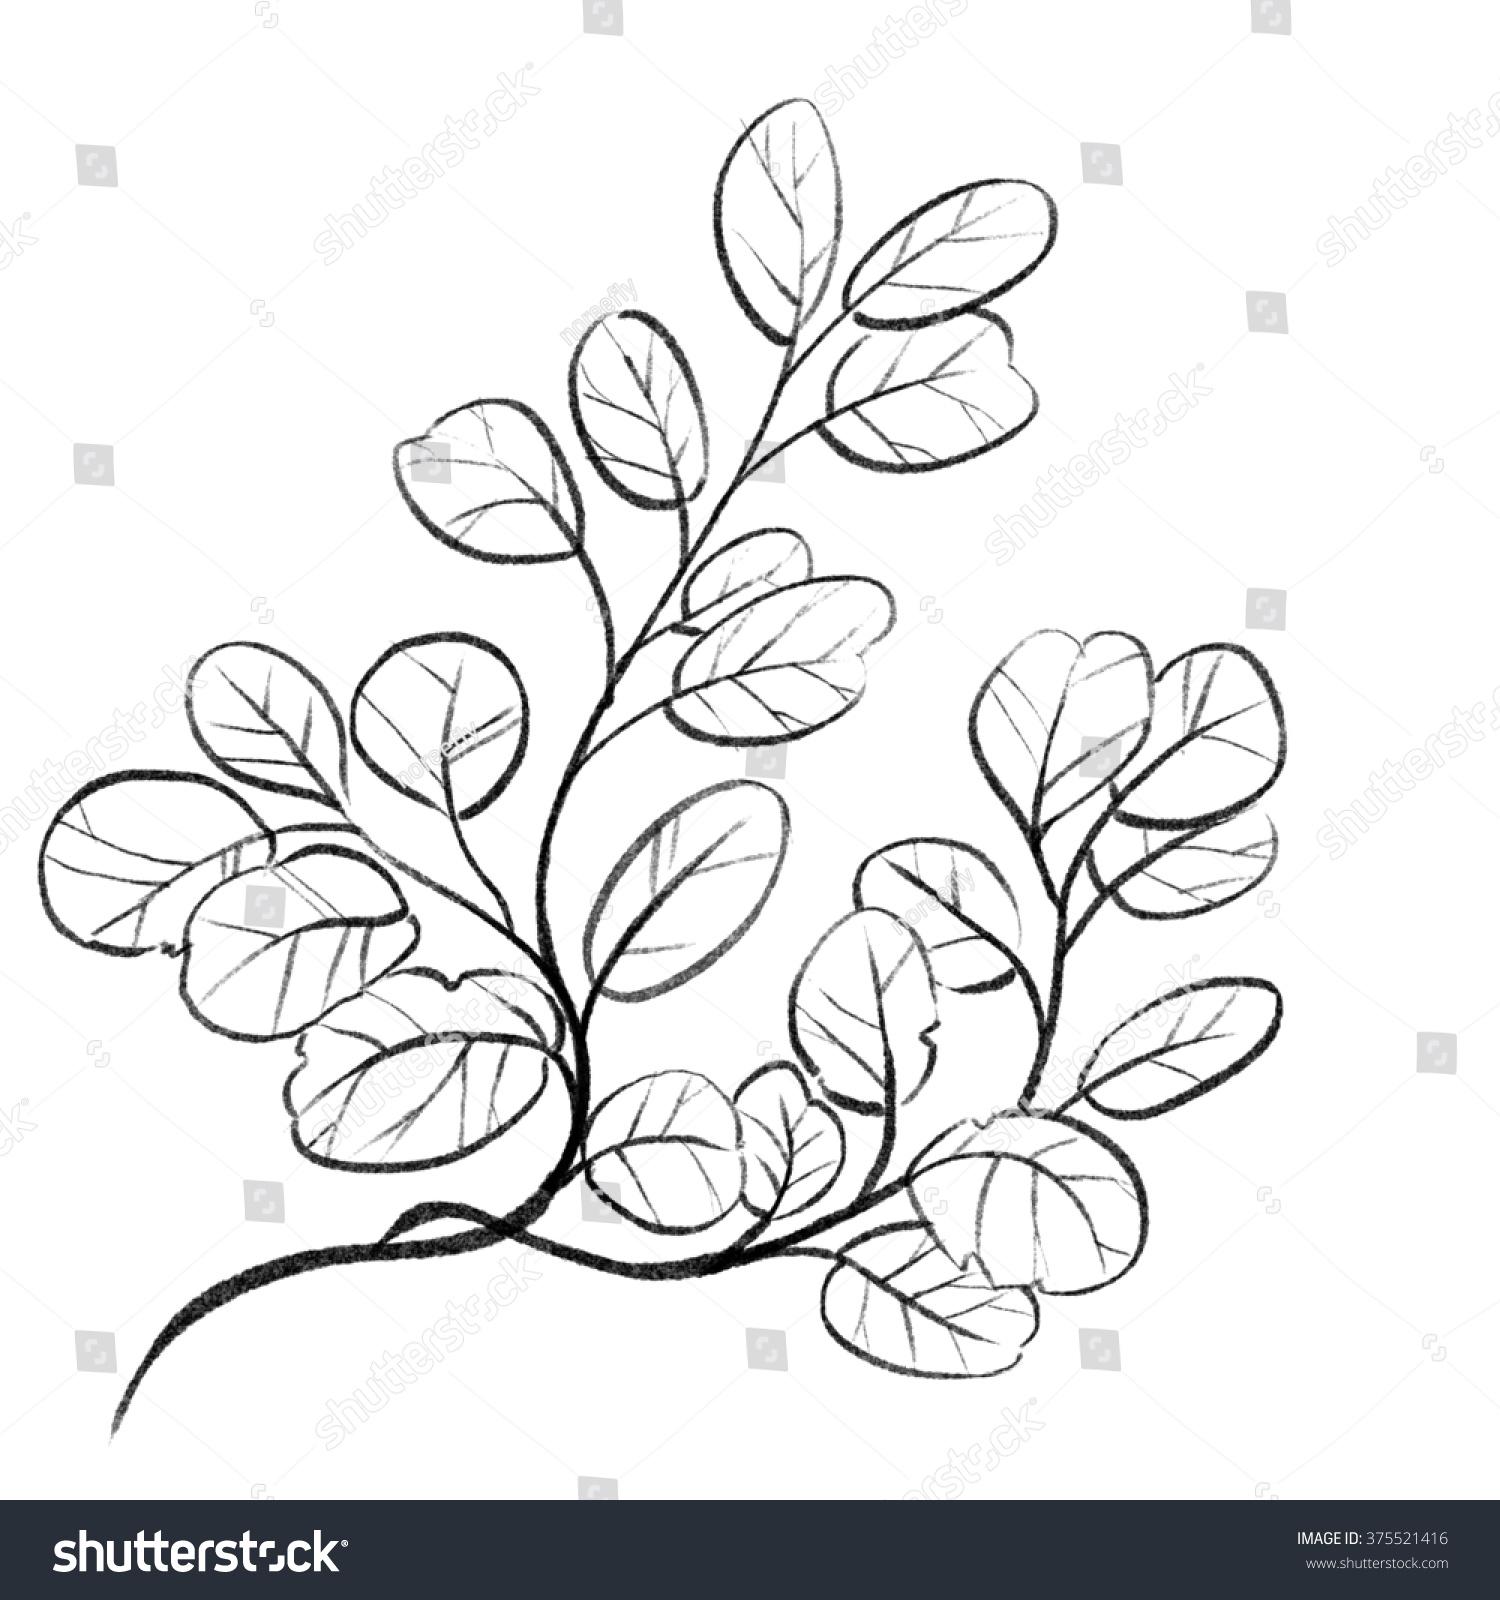 Leaves pencil sketch outline